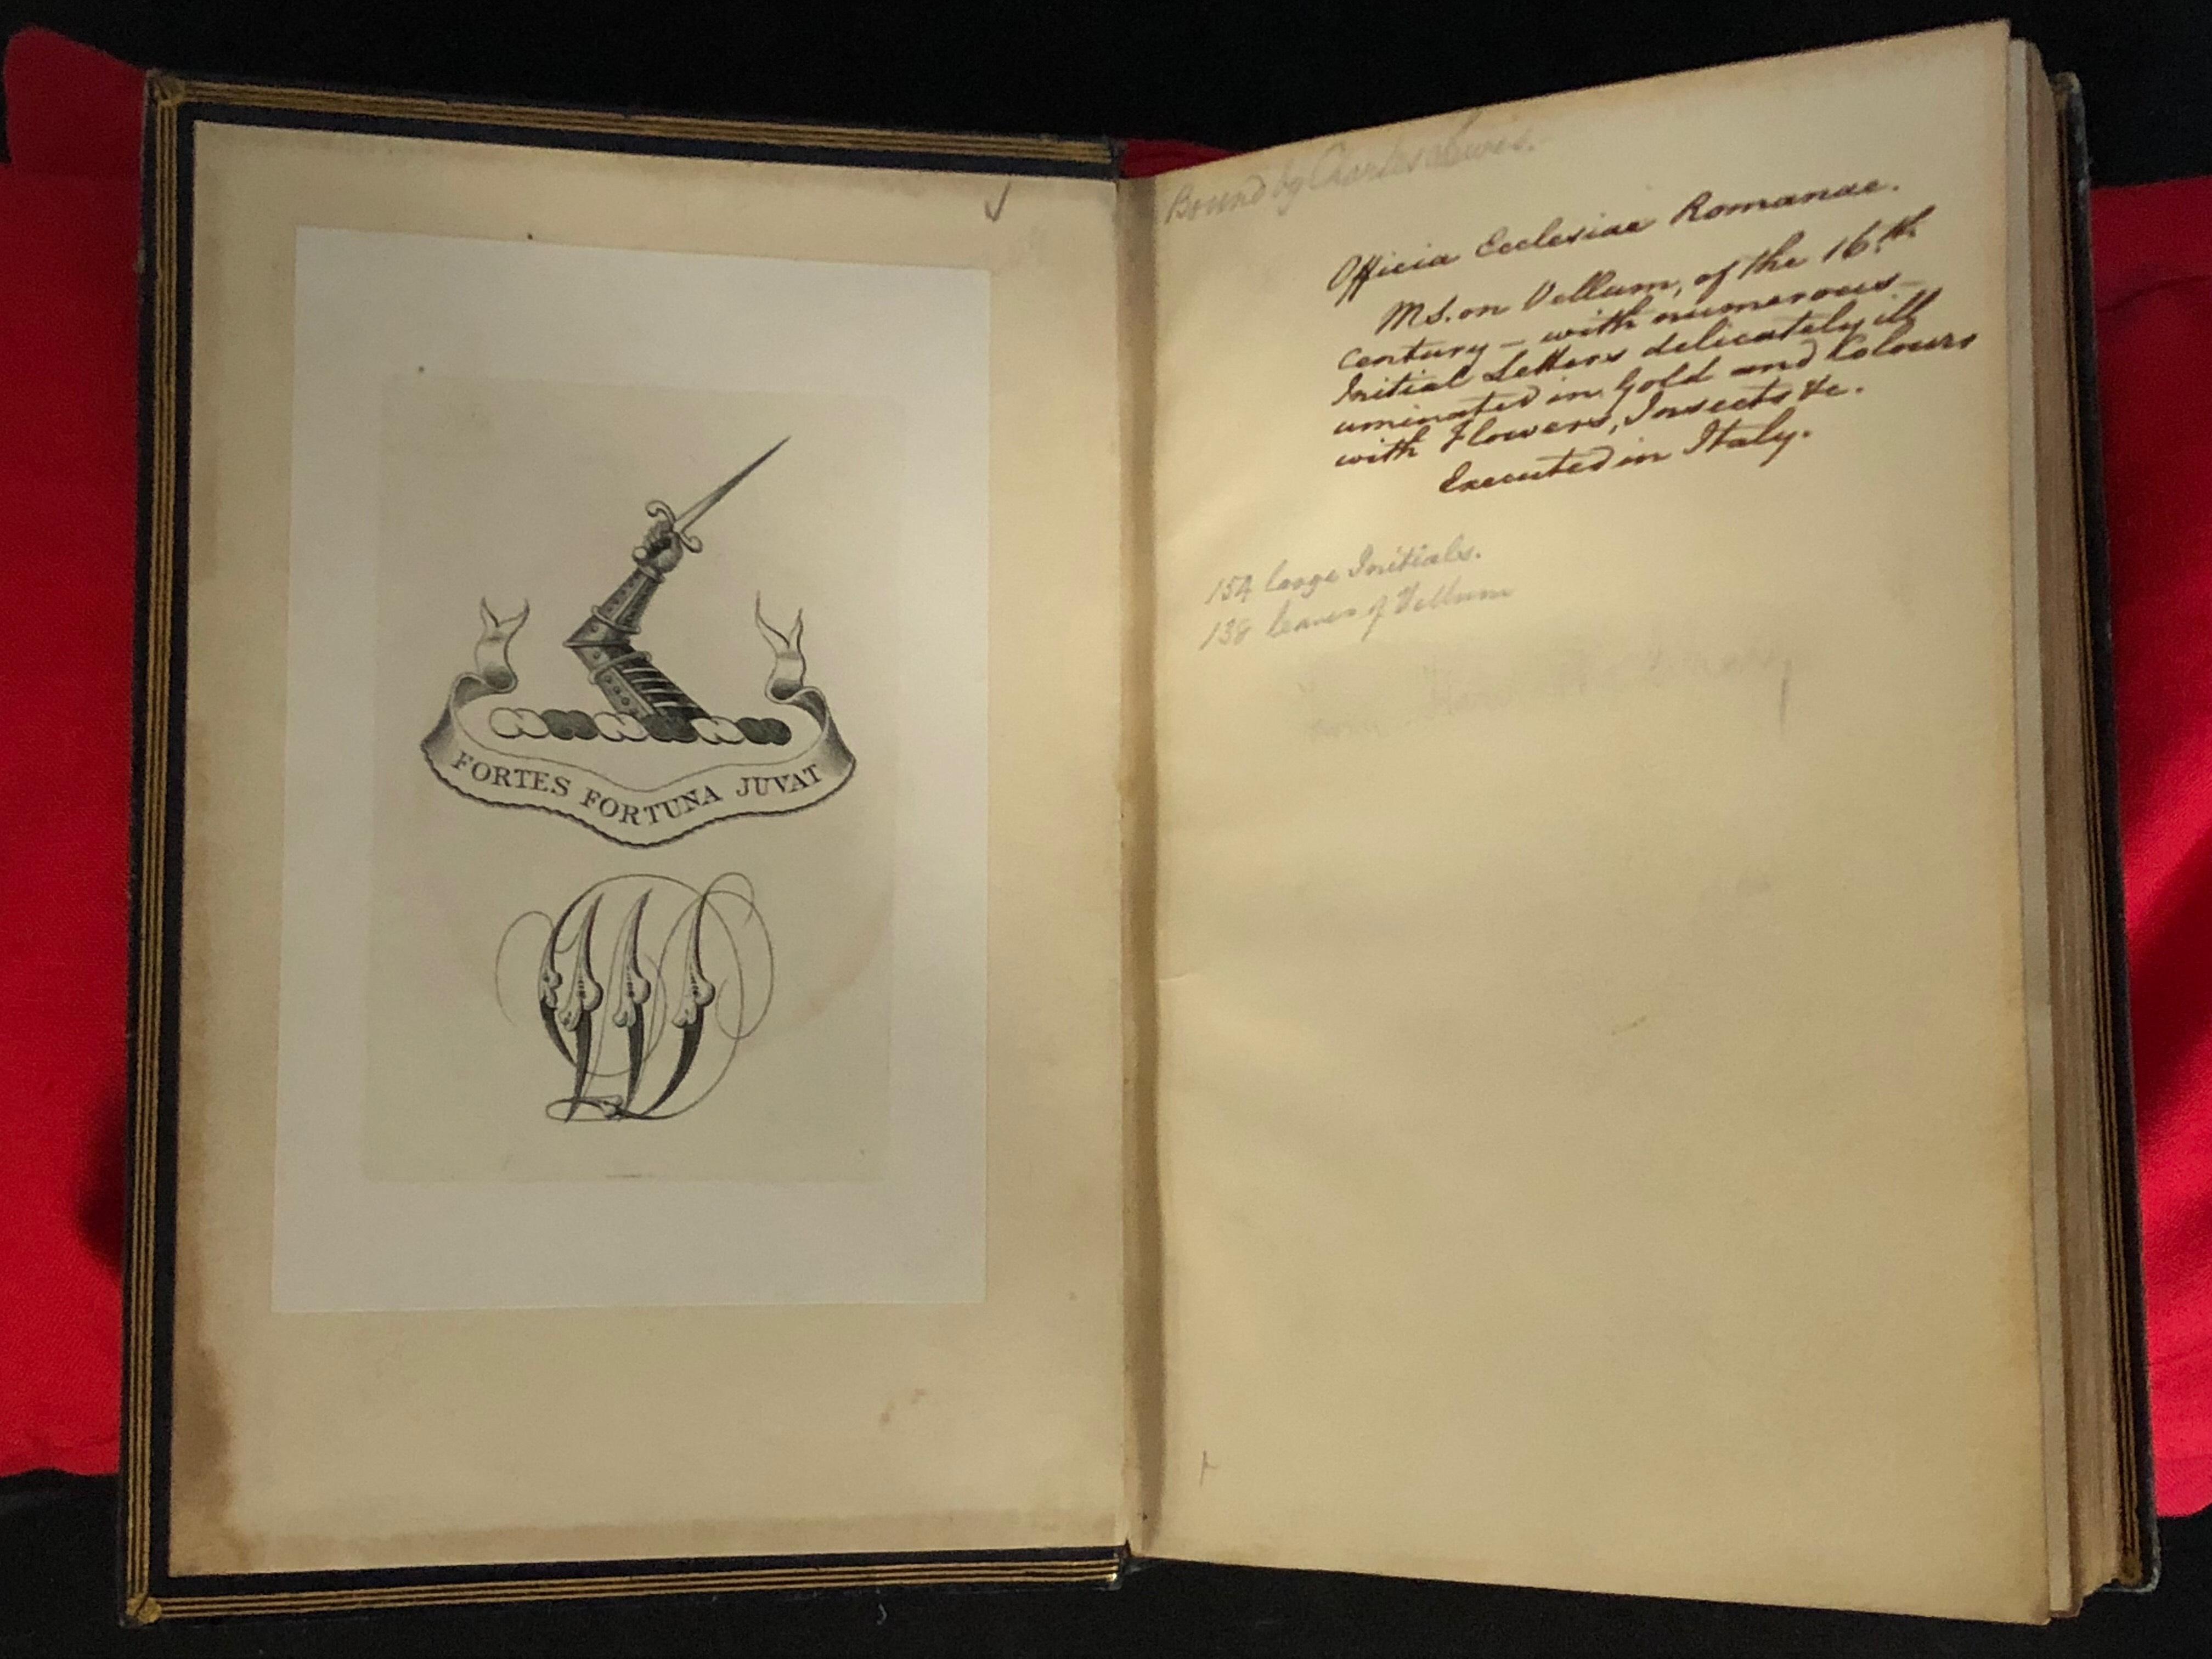 Sir William Dixson's bookplate: A manuscript on vellum